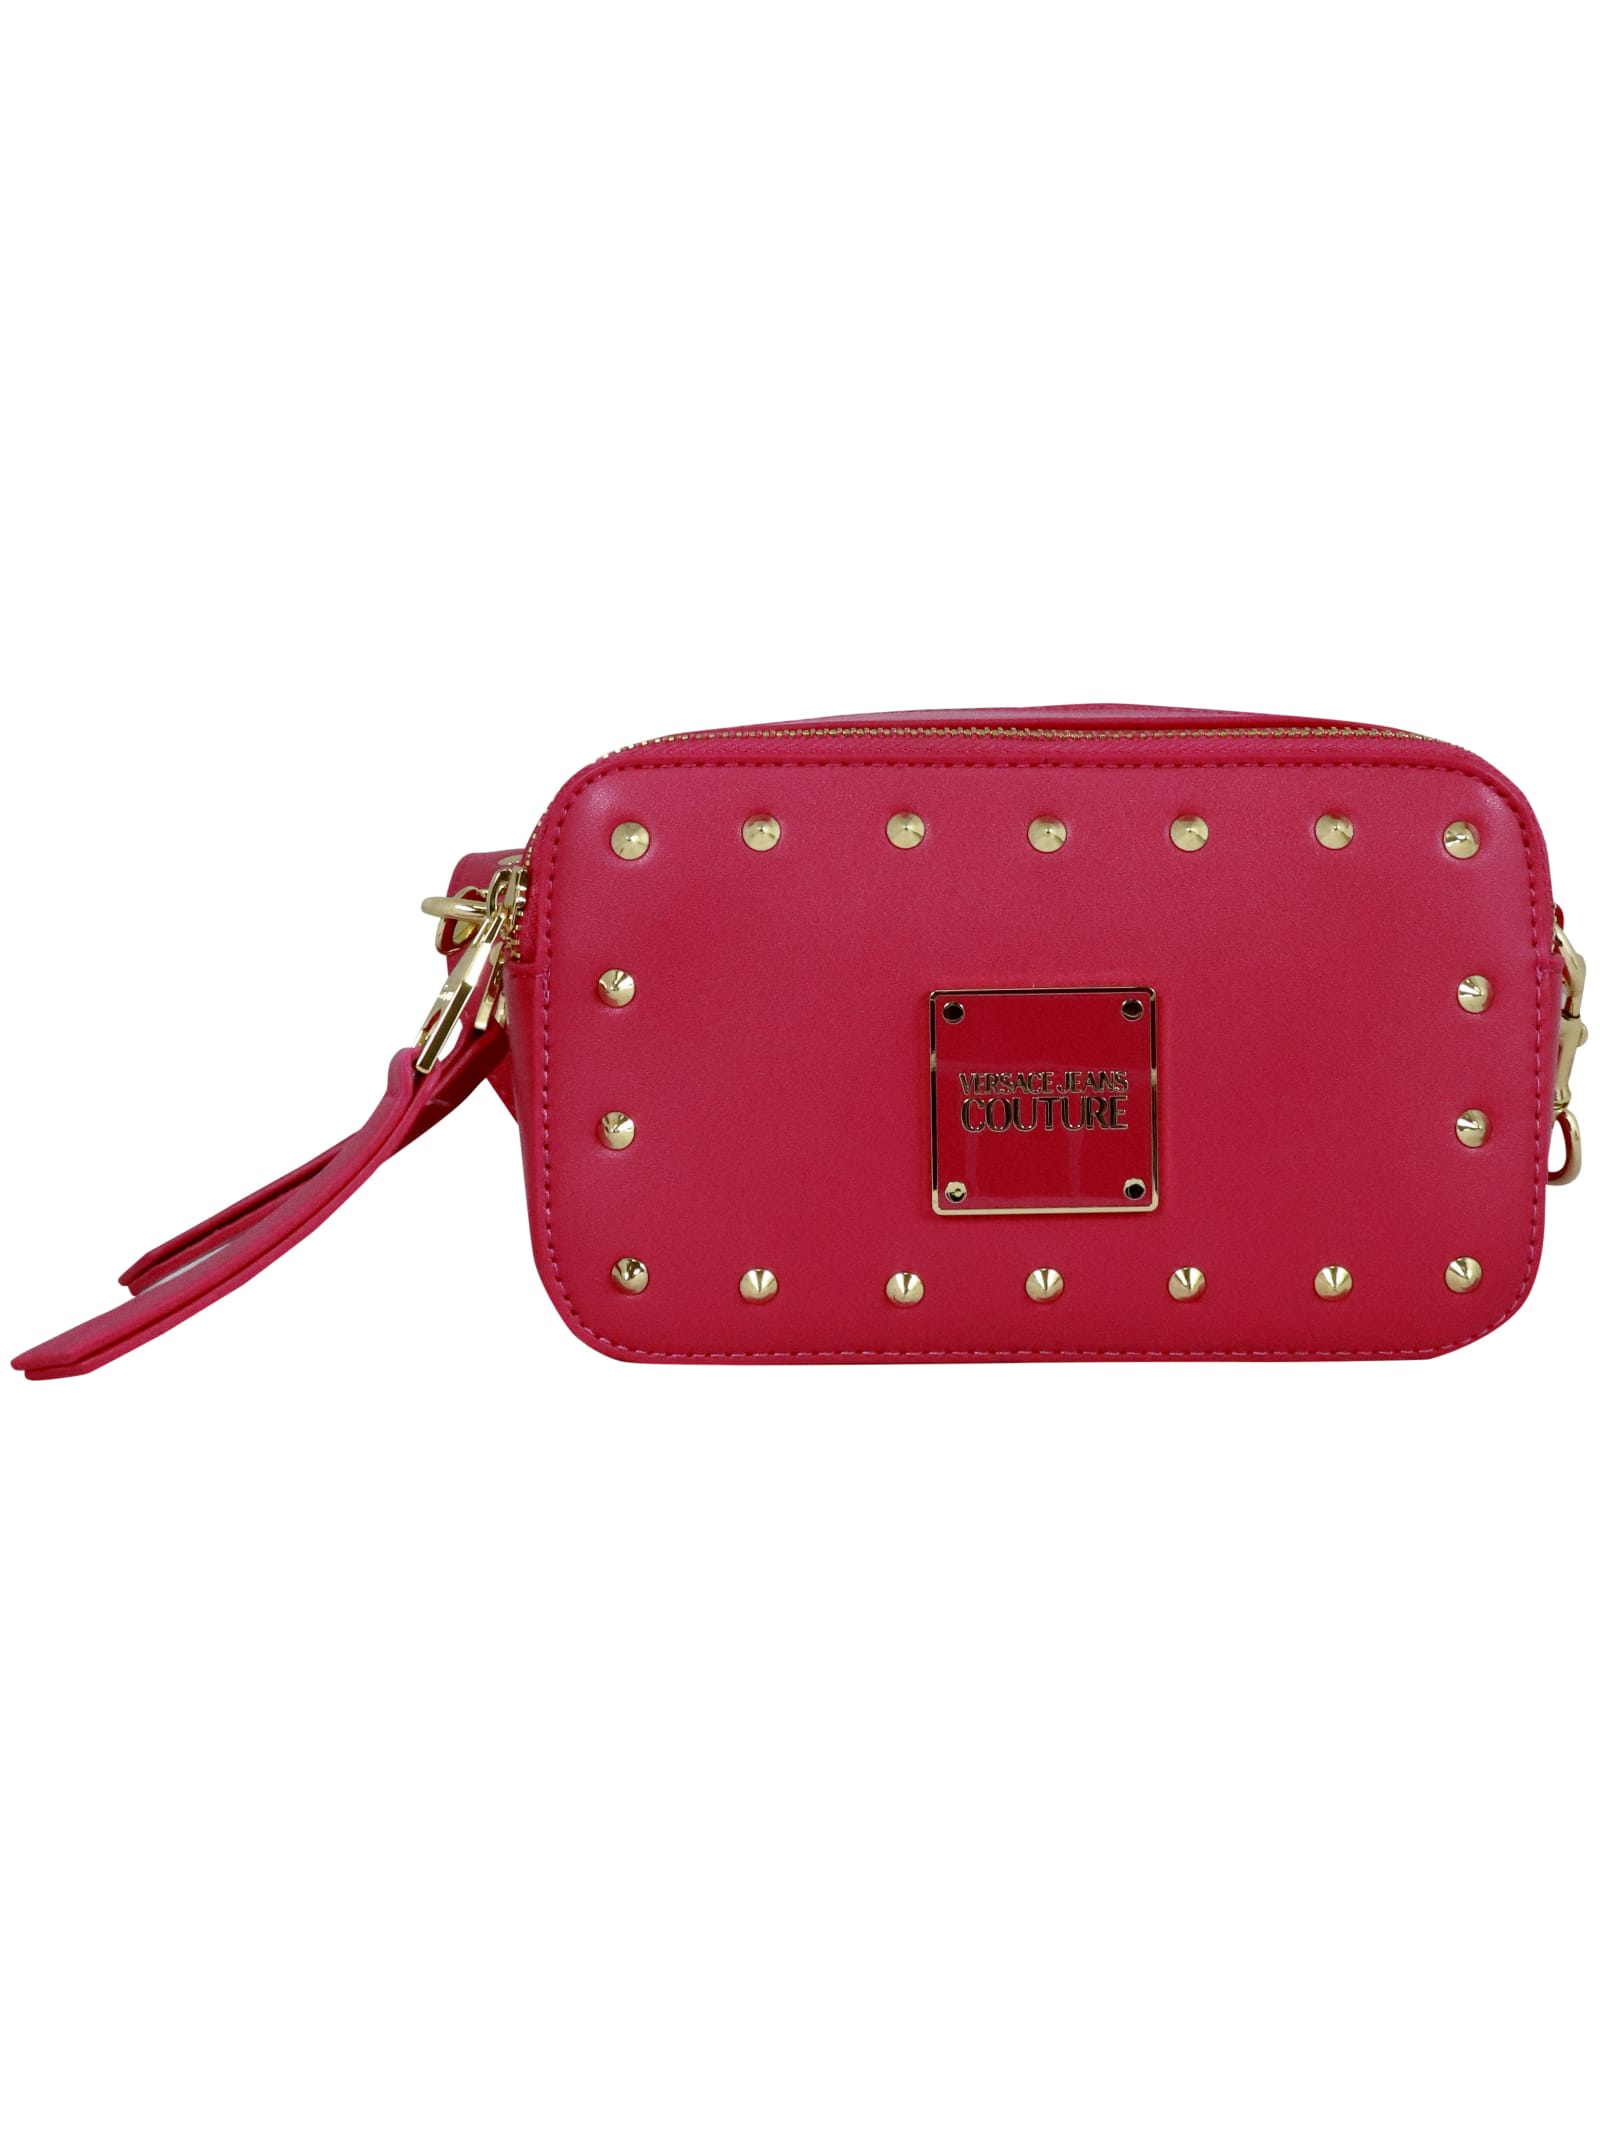 Versace Jeans Couture Nappa Revolution Studs Shoulder Bag